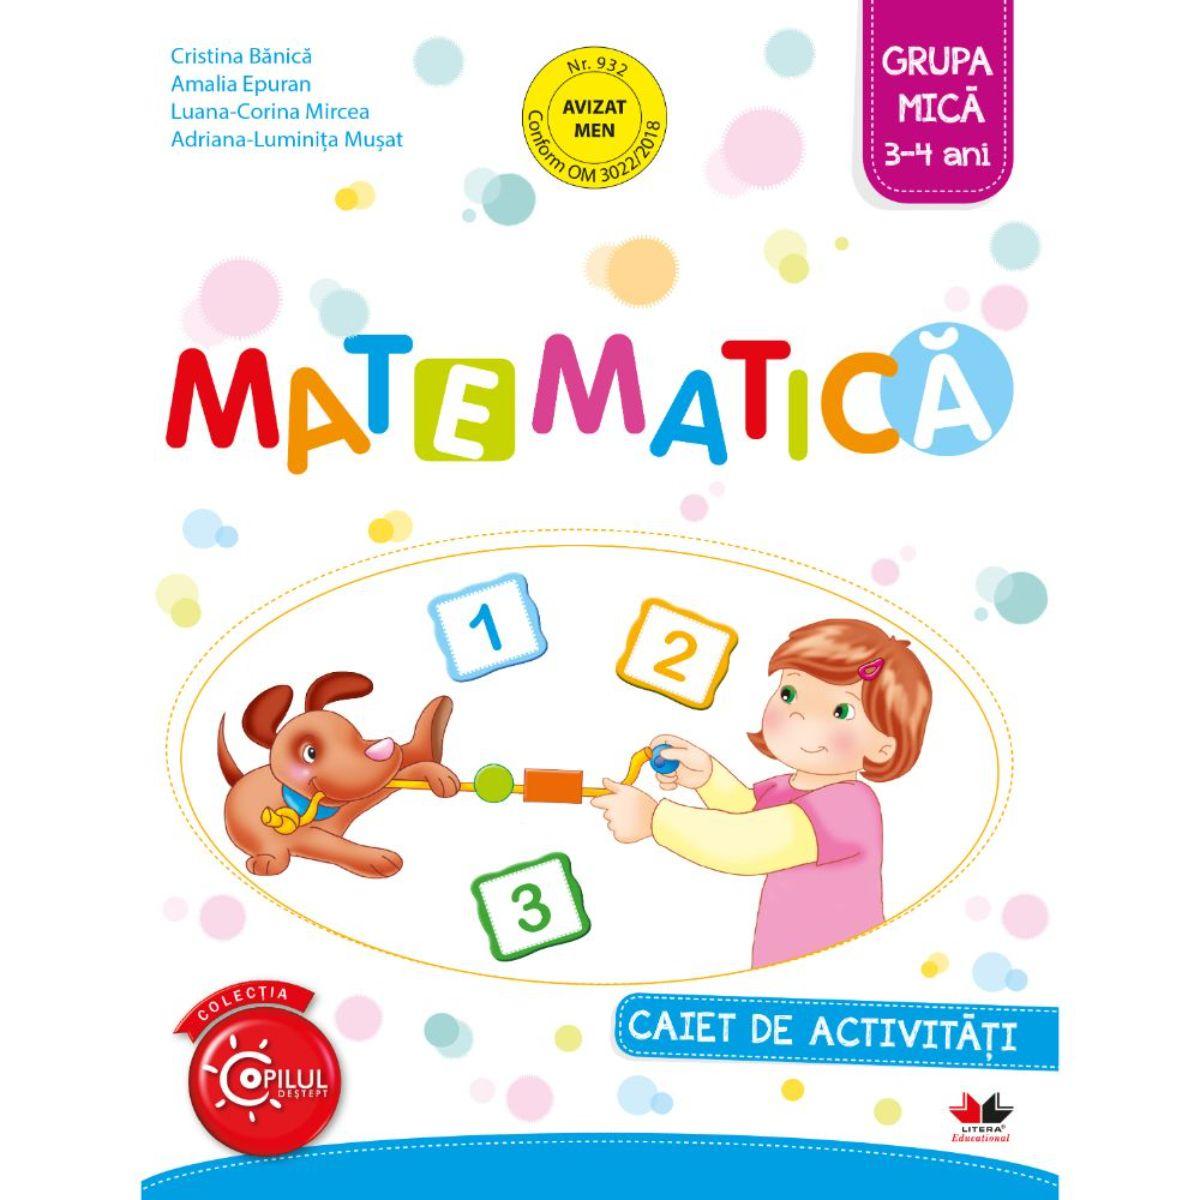 Matematica, Caiet de activitati, Grupa mica, 3-4 ani